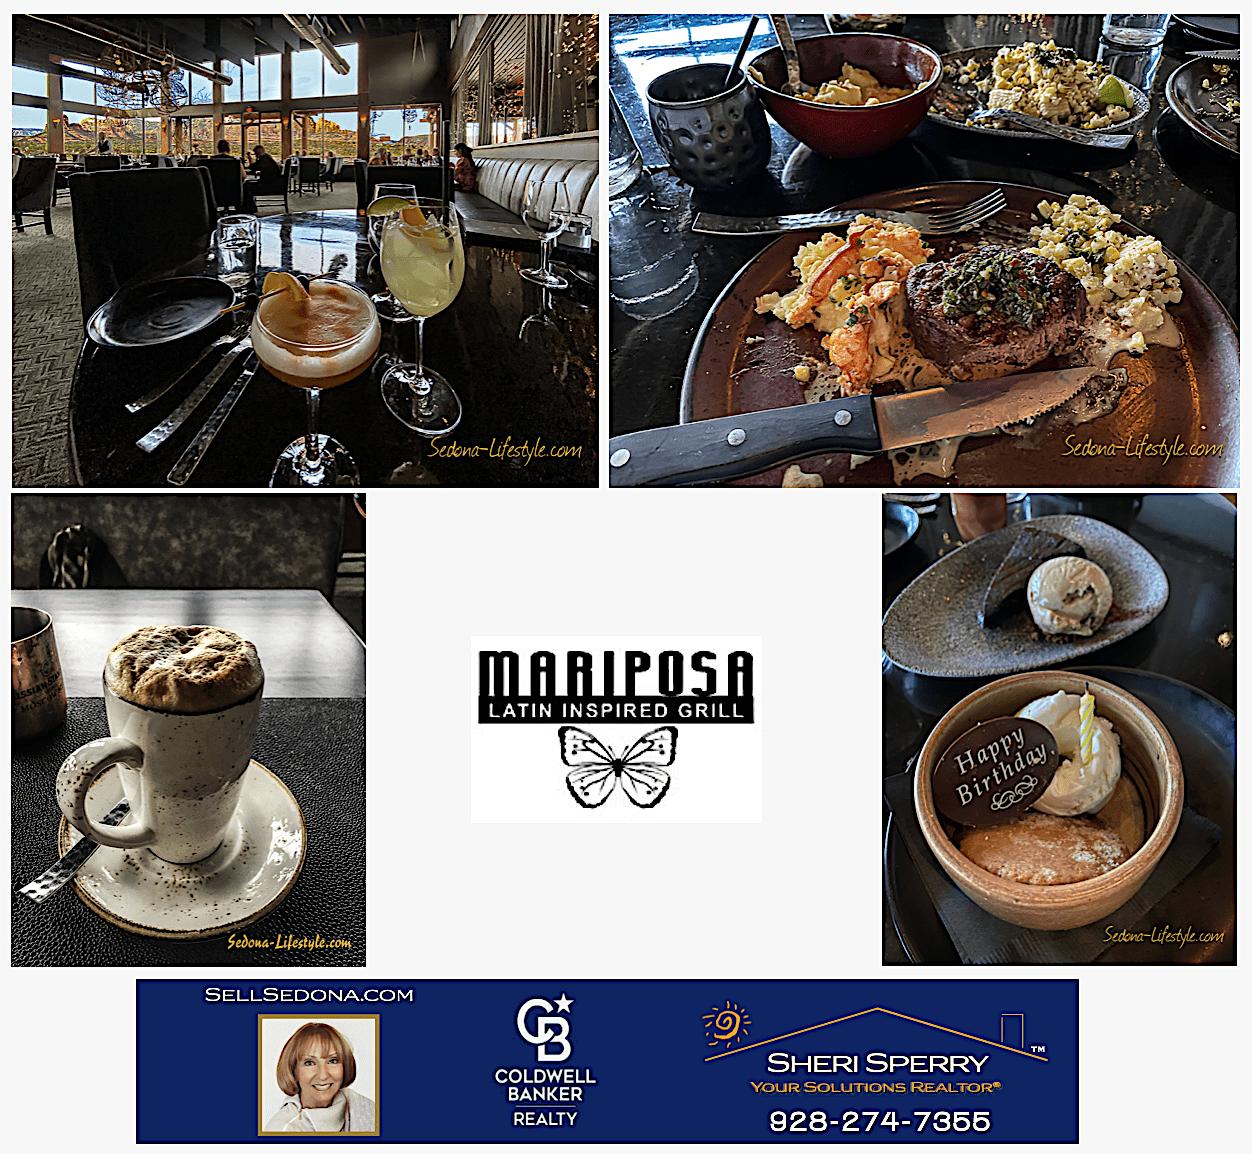 delightful cuisine with latin flair SellSedona.com Mariposa